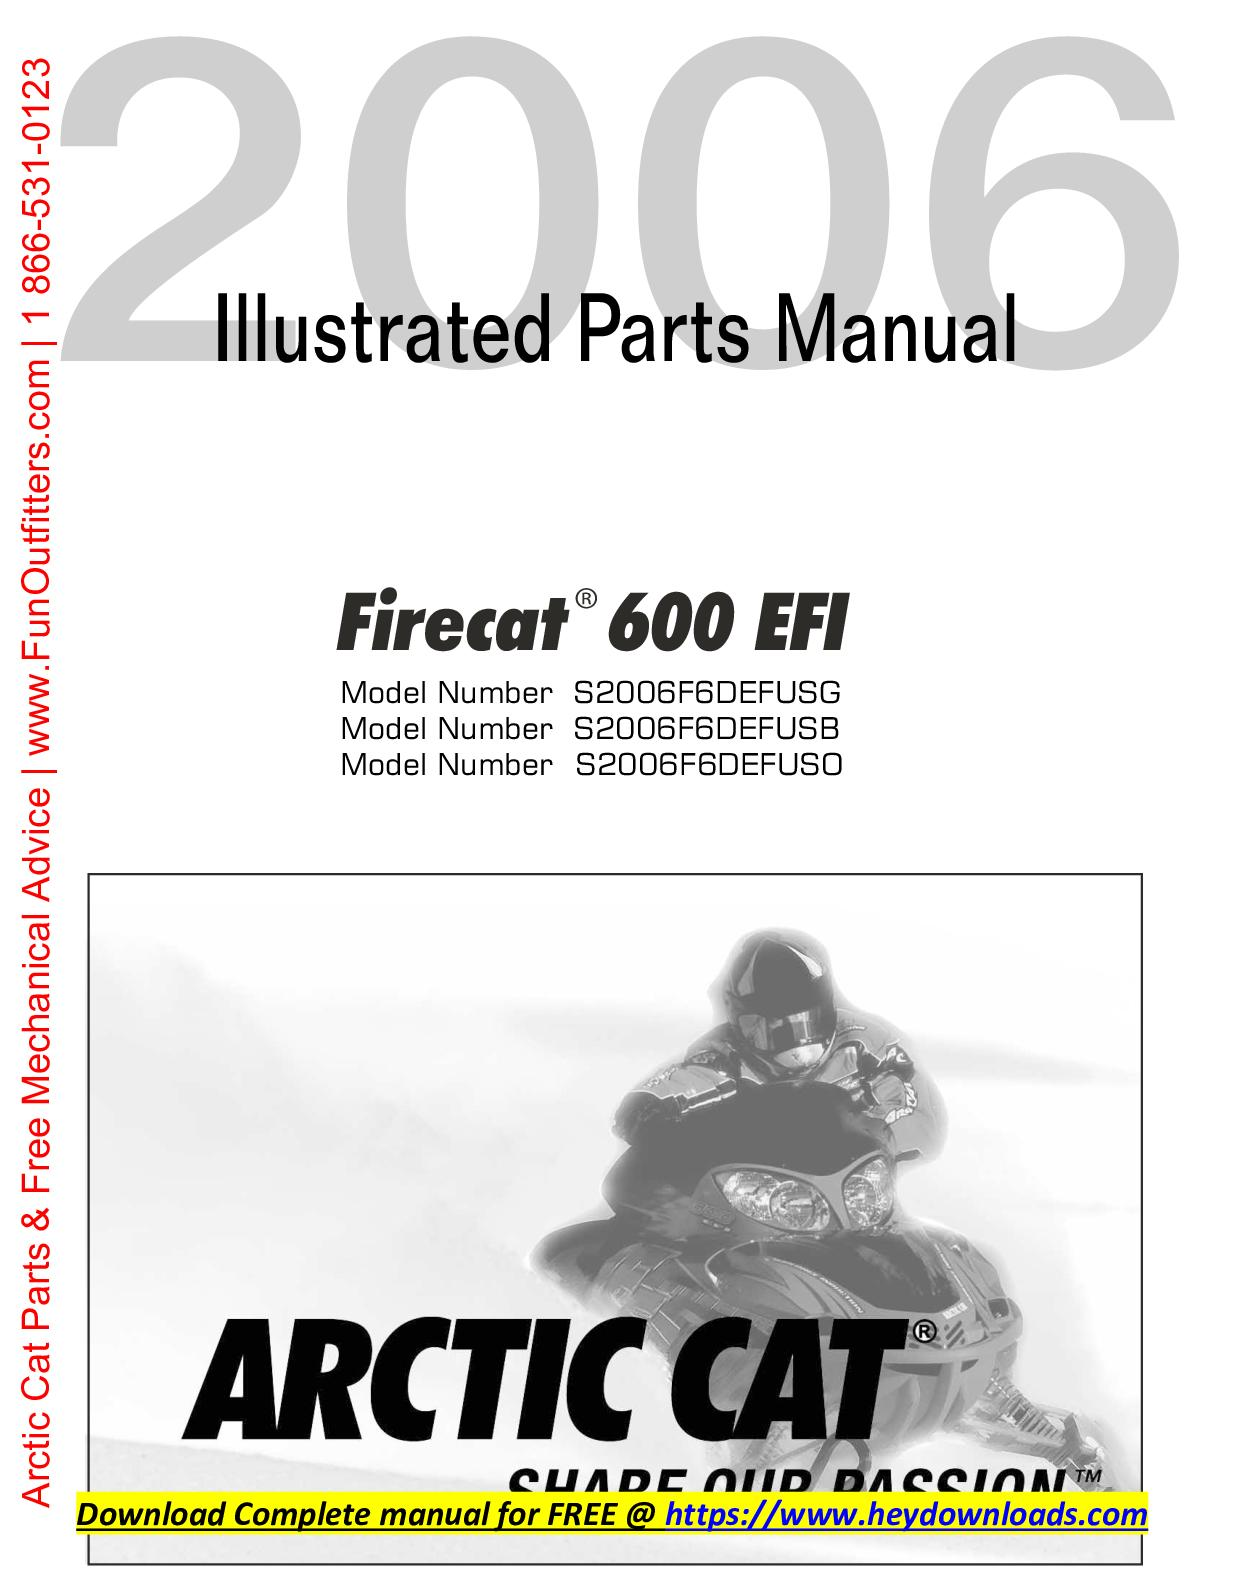 Arctic Cat Parts Diagram | Calameo Arctic Cat Snowmobile F6 Efi Parts Manual Catalog Download